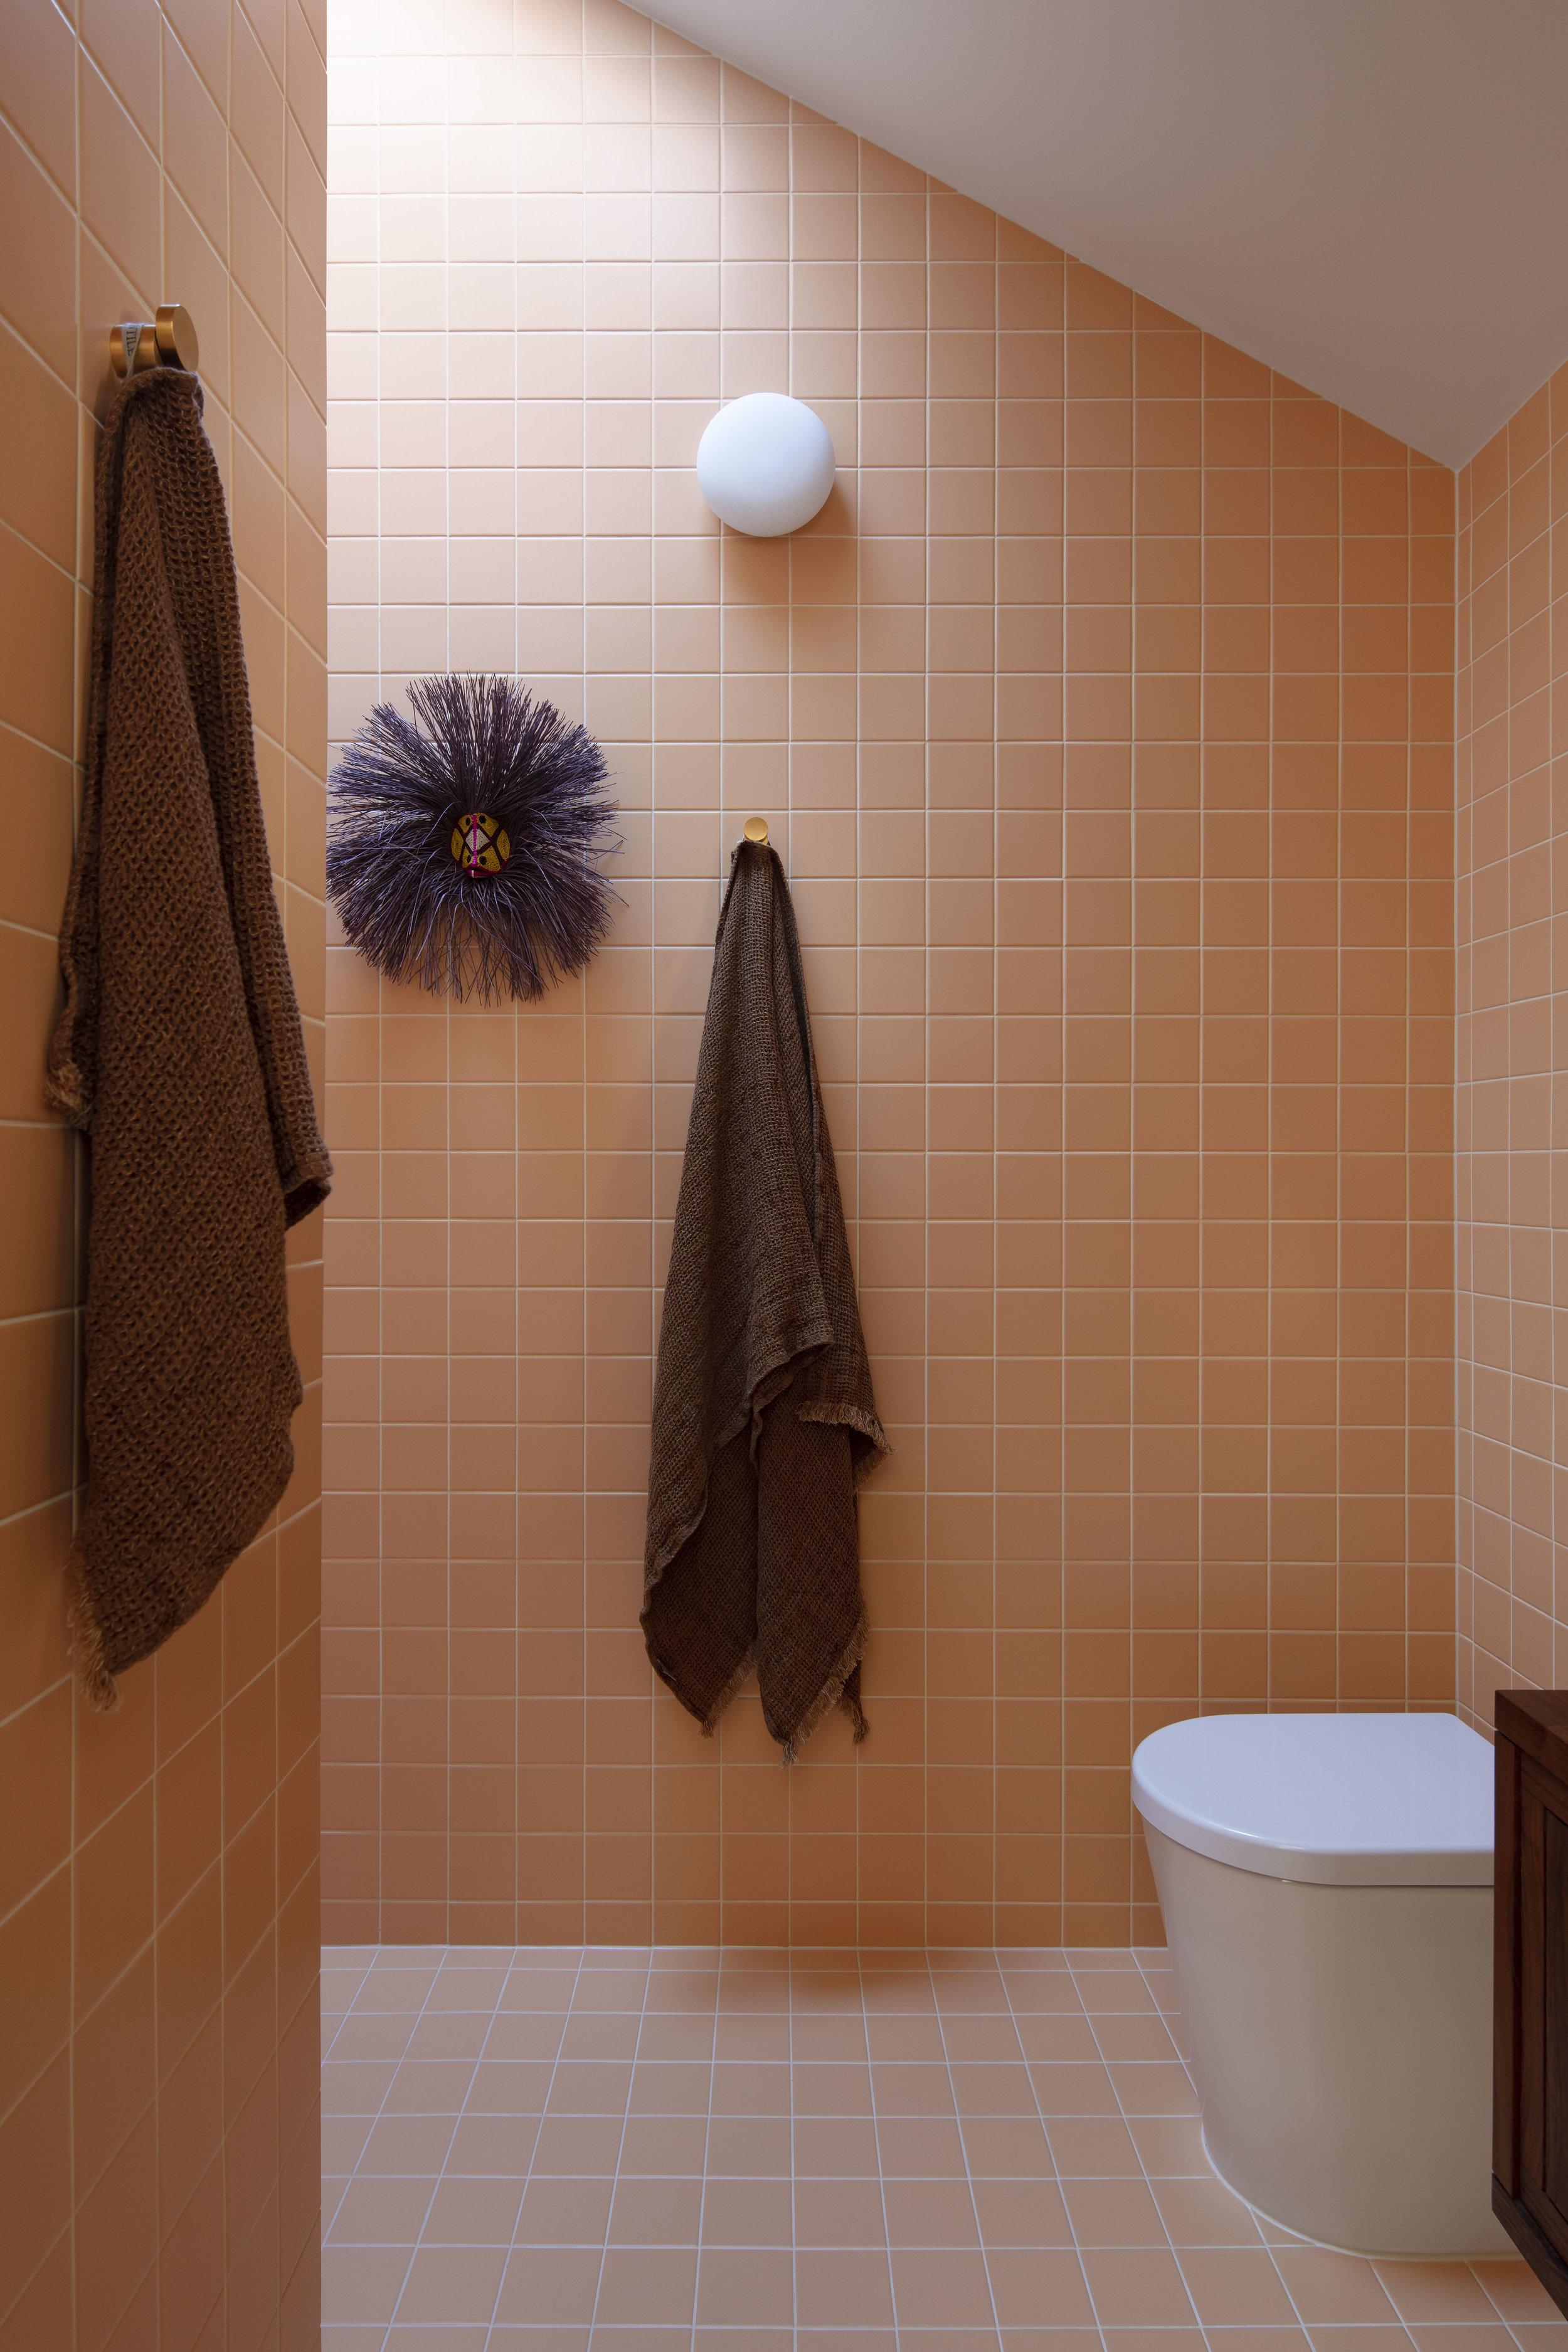 MANI-One Mani House-042_Int Colour-Orange Ensuite.jpg